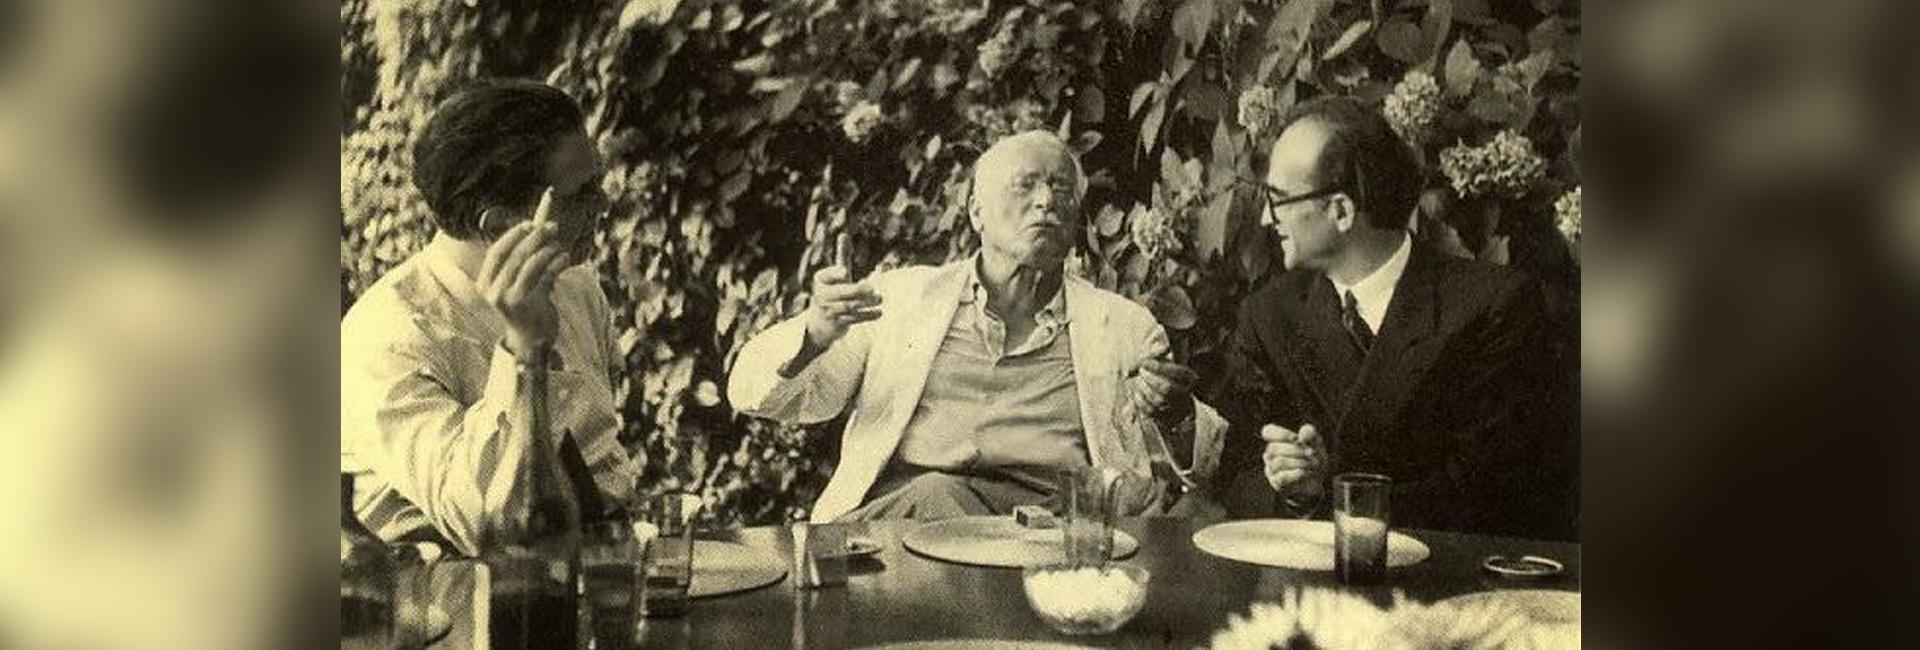 Mircea Eliade Carl Gustav Jung Matricea Romaneasca slider